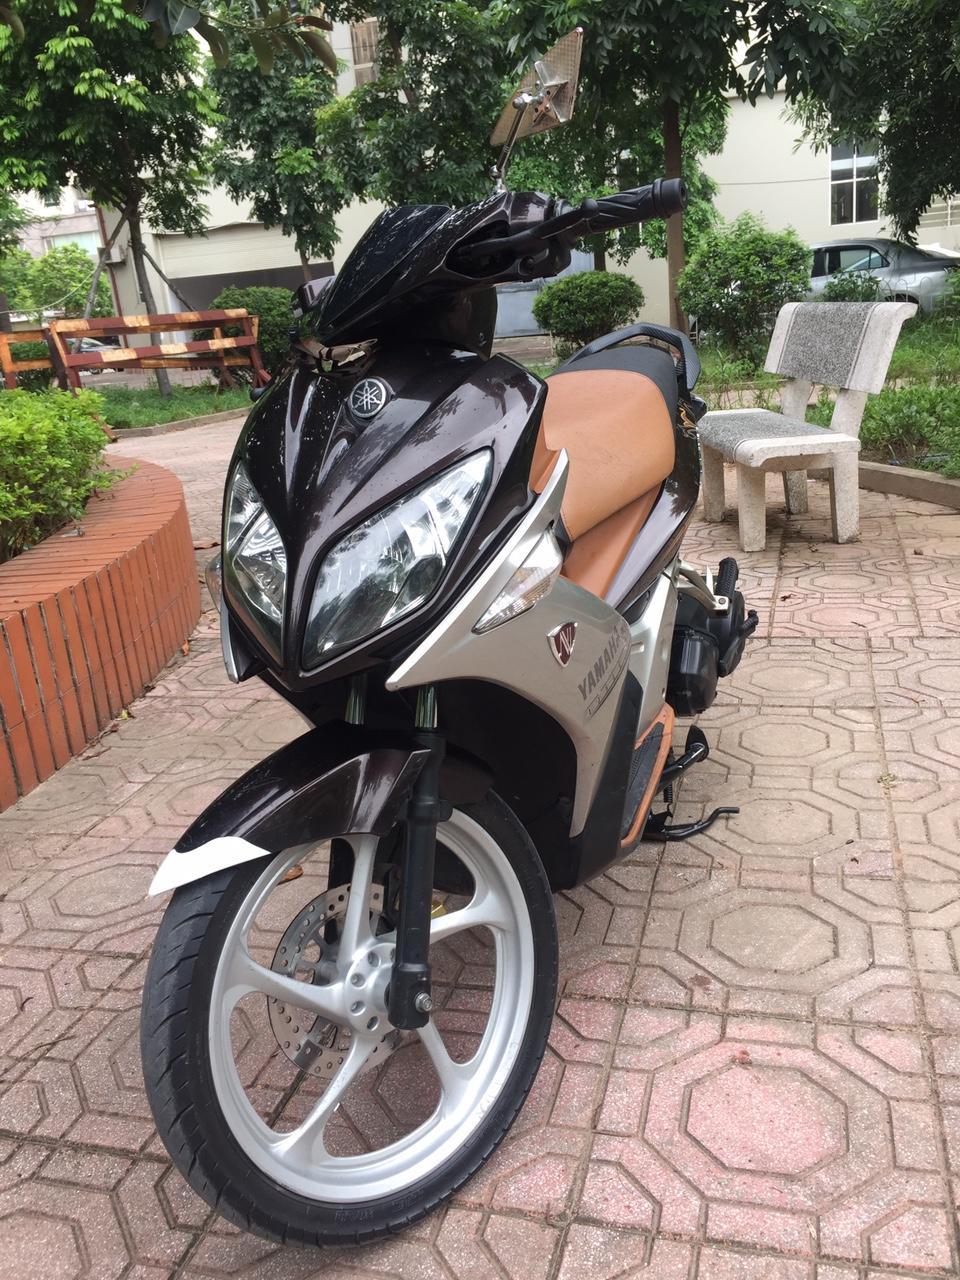 Rao ban xe Yamaha Nouvolx 135 Nau rat moi may chay cuc phe - 6